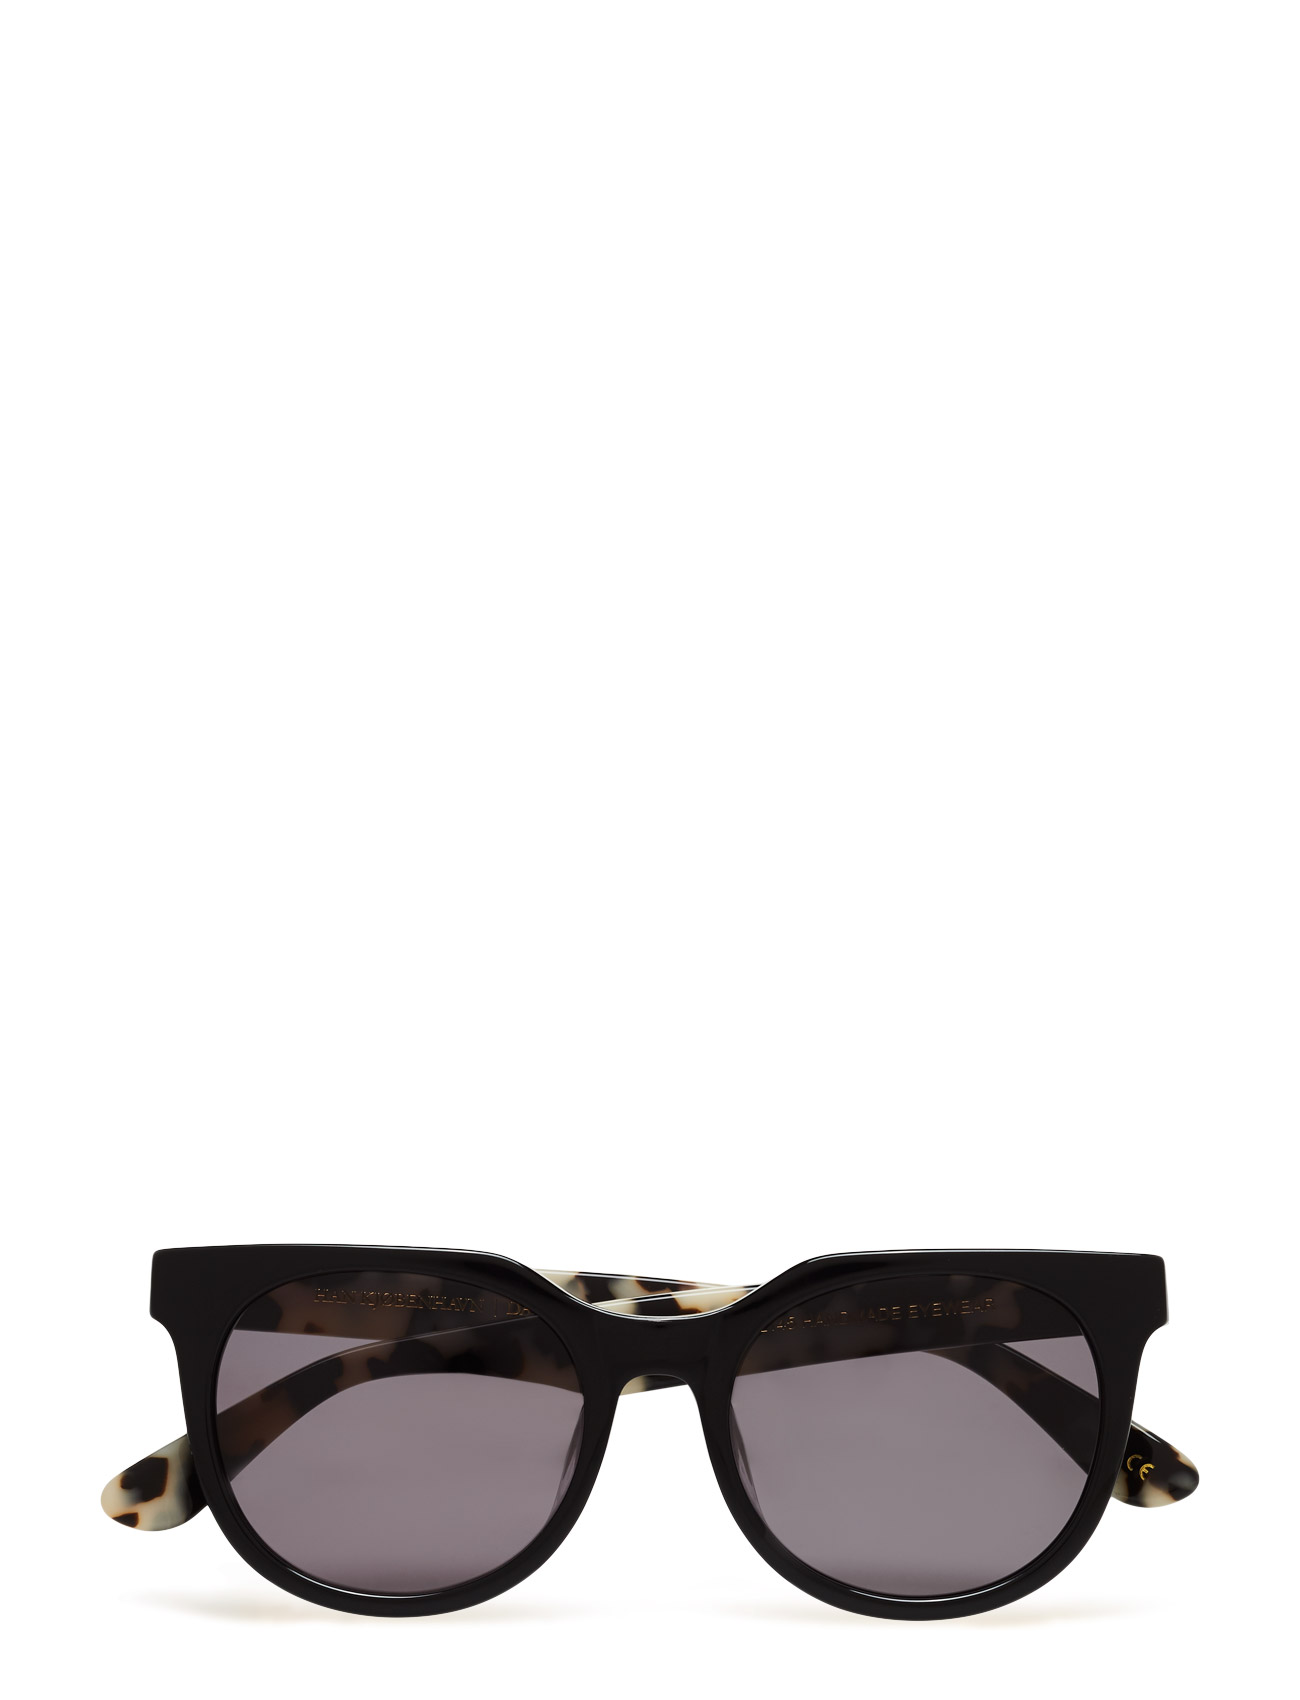 d6aa93c8 Superstilige Paul Senior – Black/ Snow HAN Kjøbenhavn Solbriller til i  flotte materialer